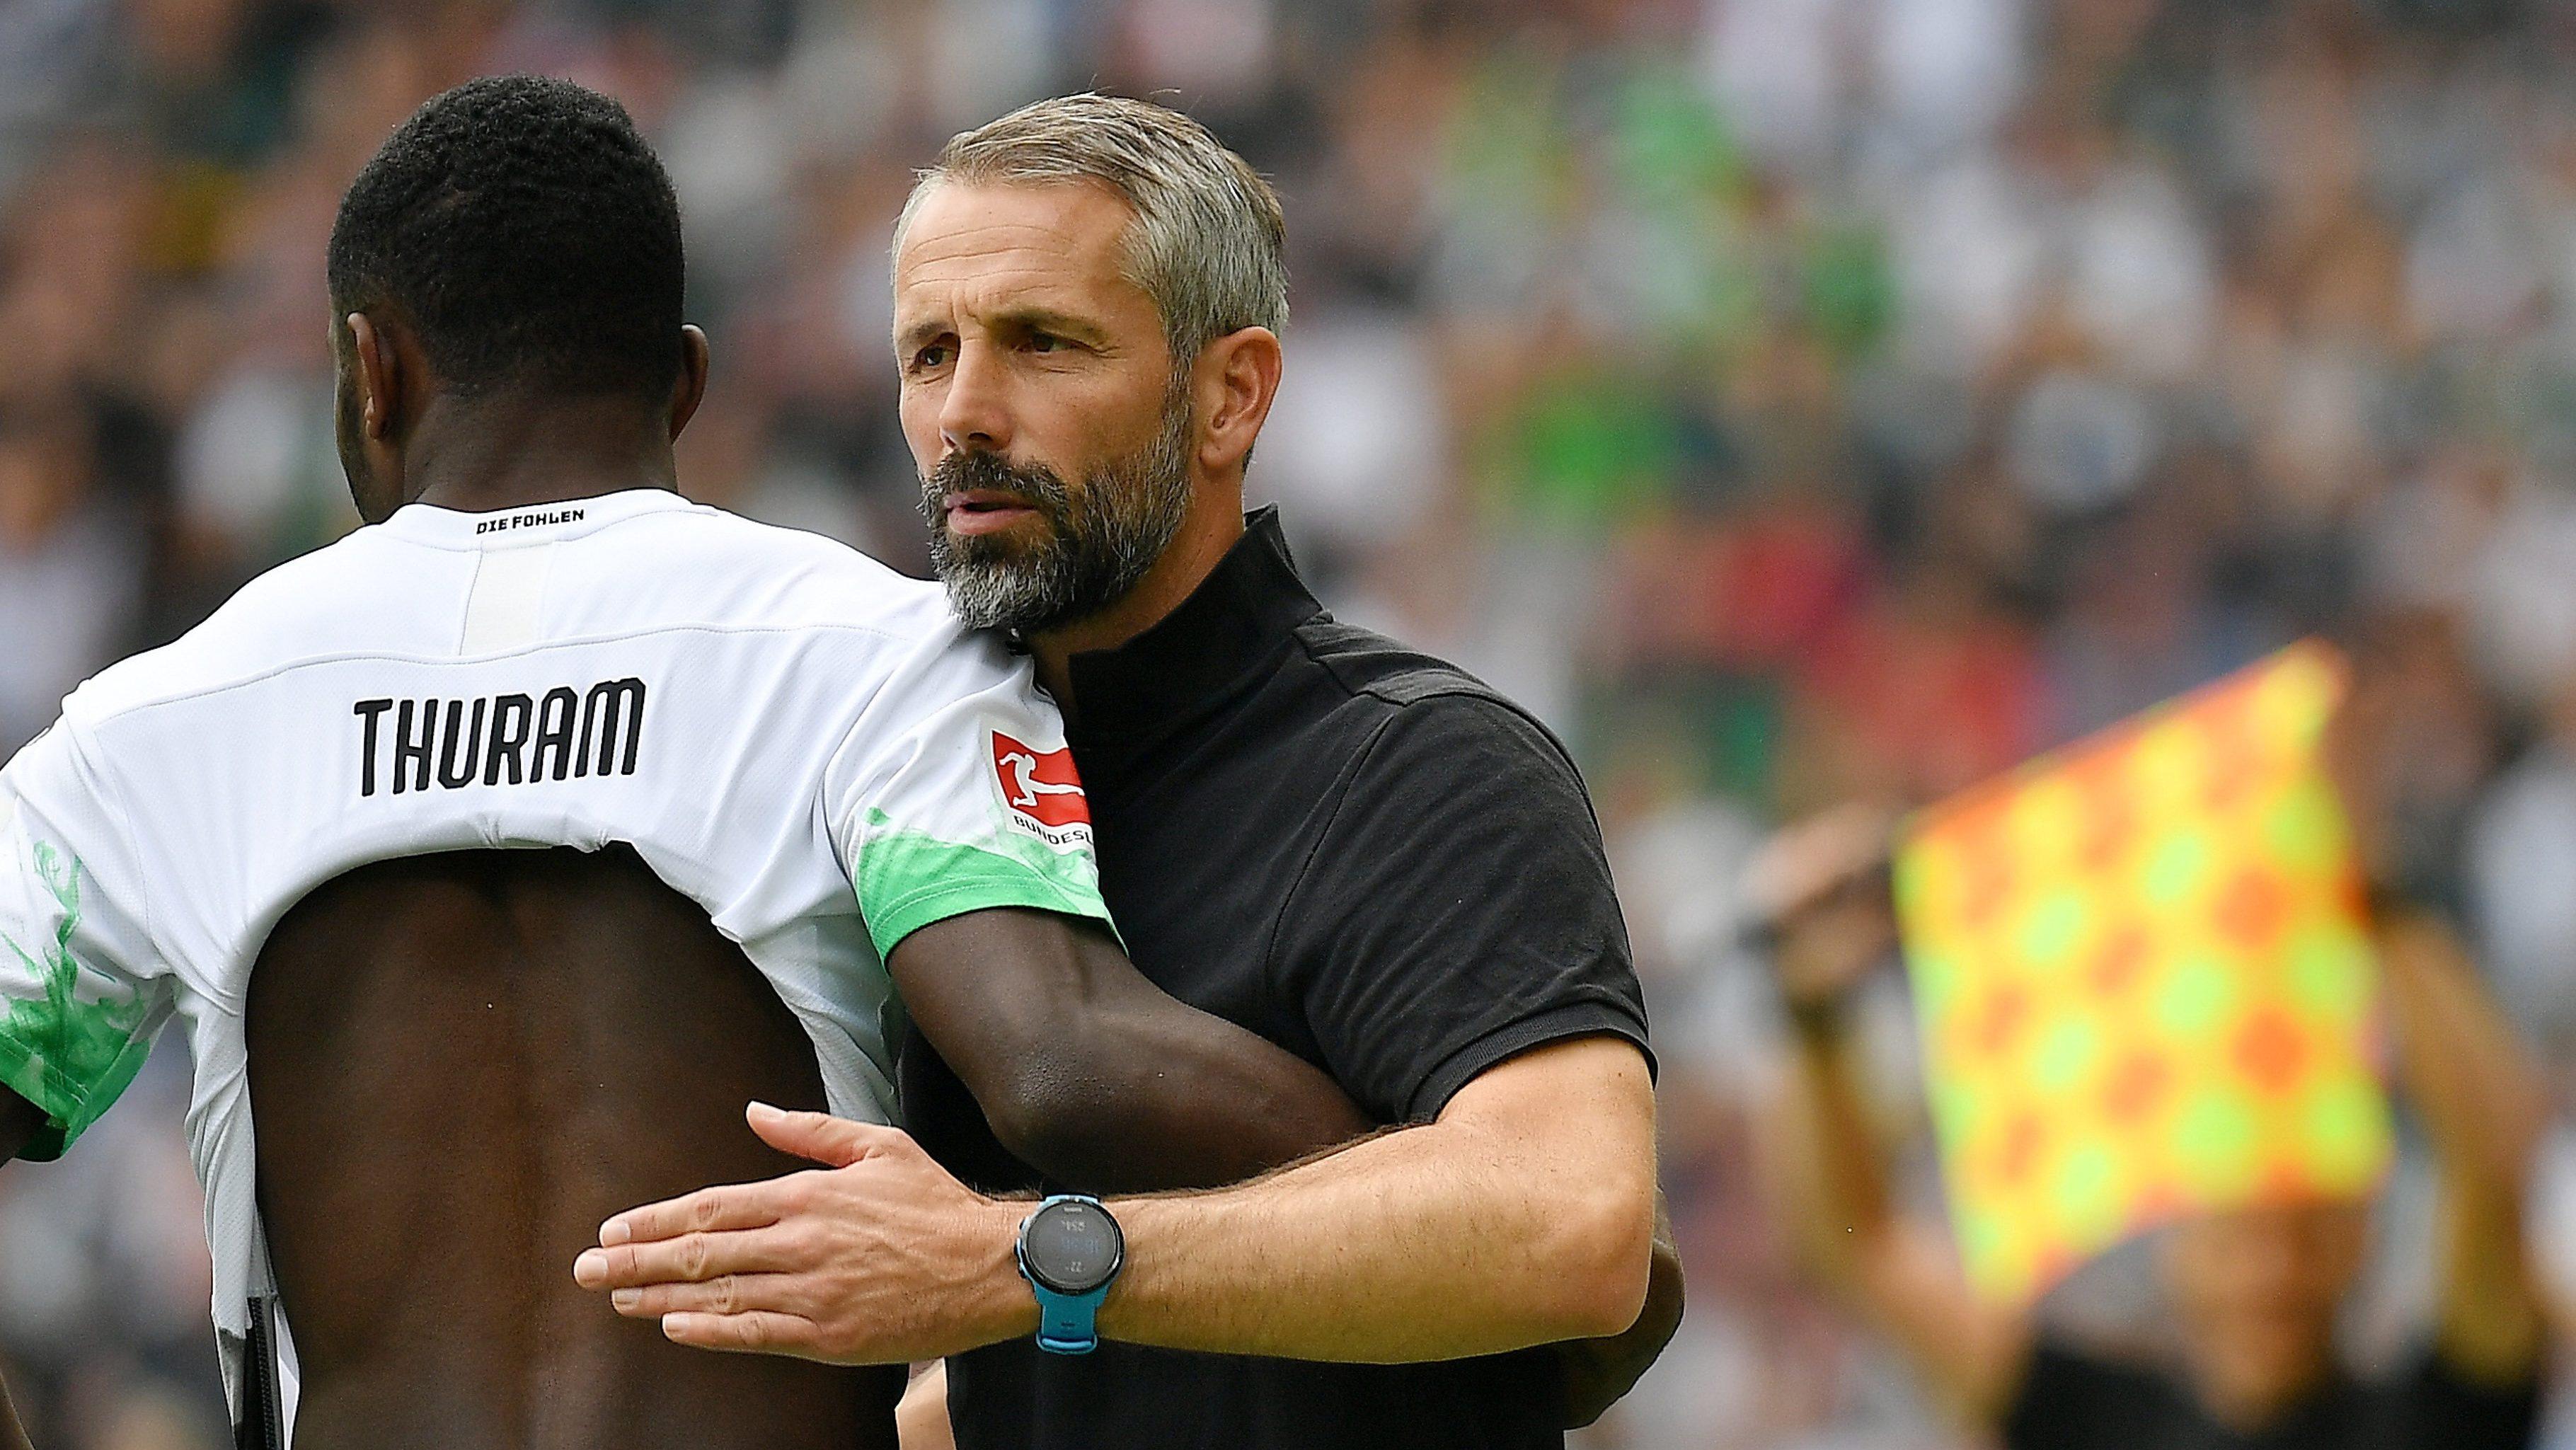 Calciomercato, Marcus Thuram al Borussia Monchengladbach ...   Marcus Thuram